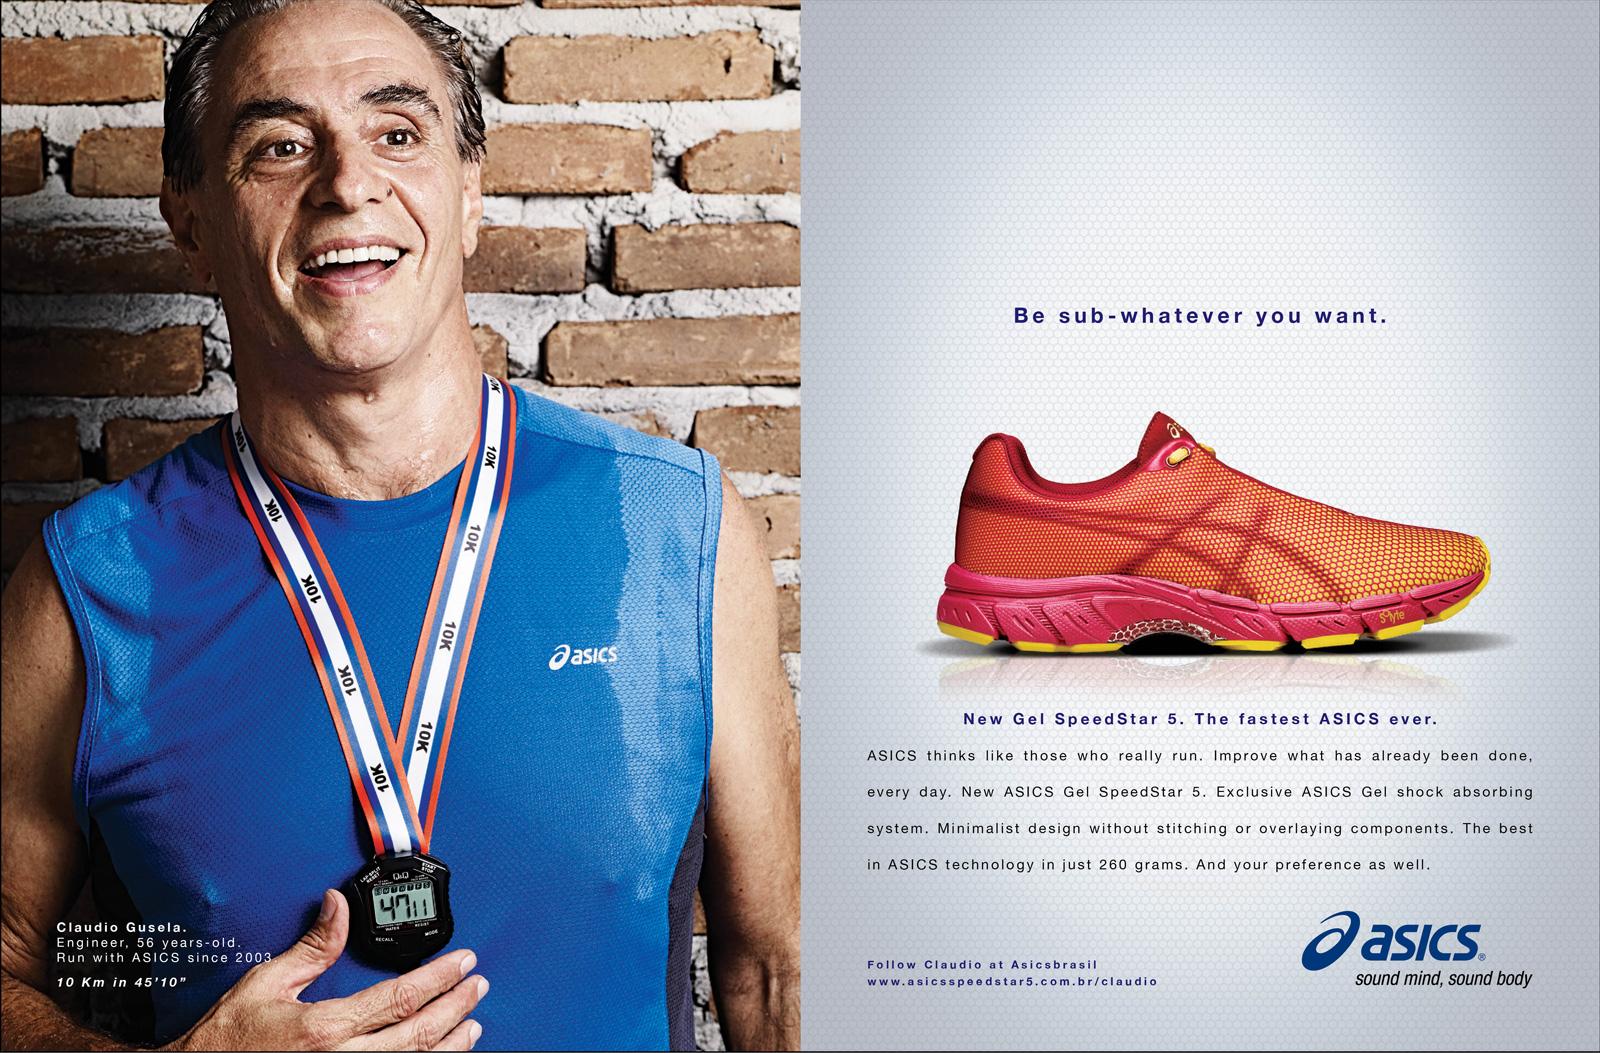 ASICS Print Ad - Medal, 2